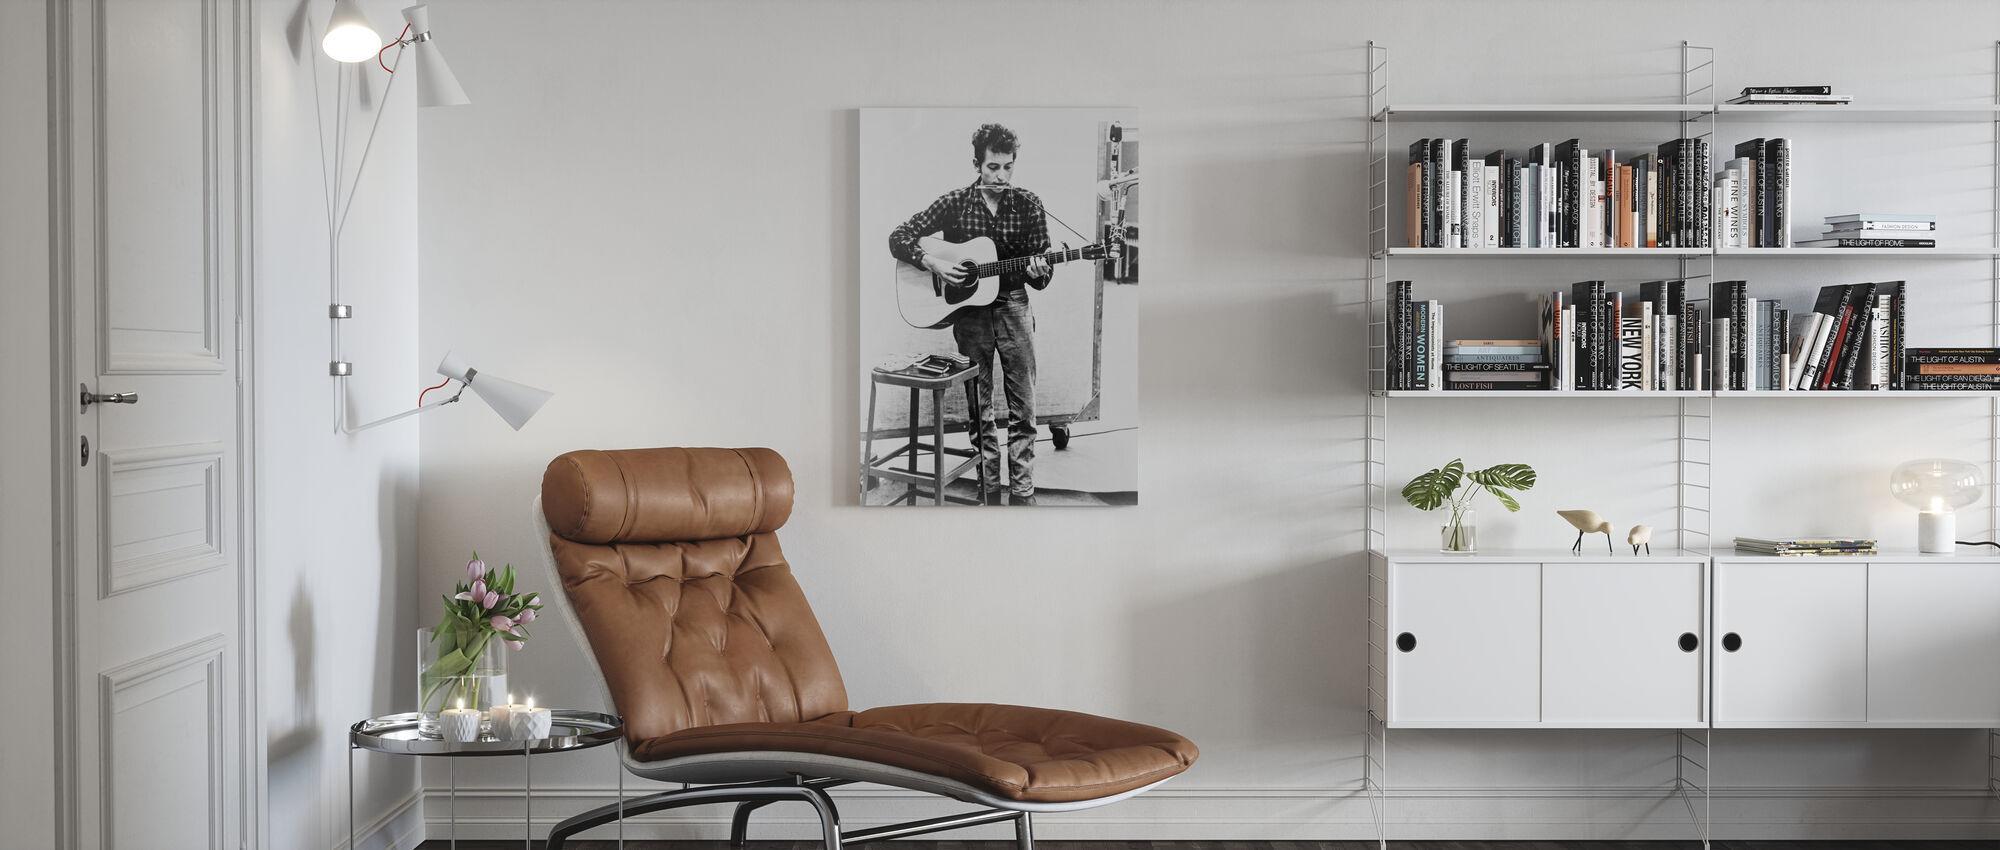 Mr Tambourine Man - Canvas print - Living Room